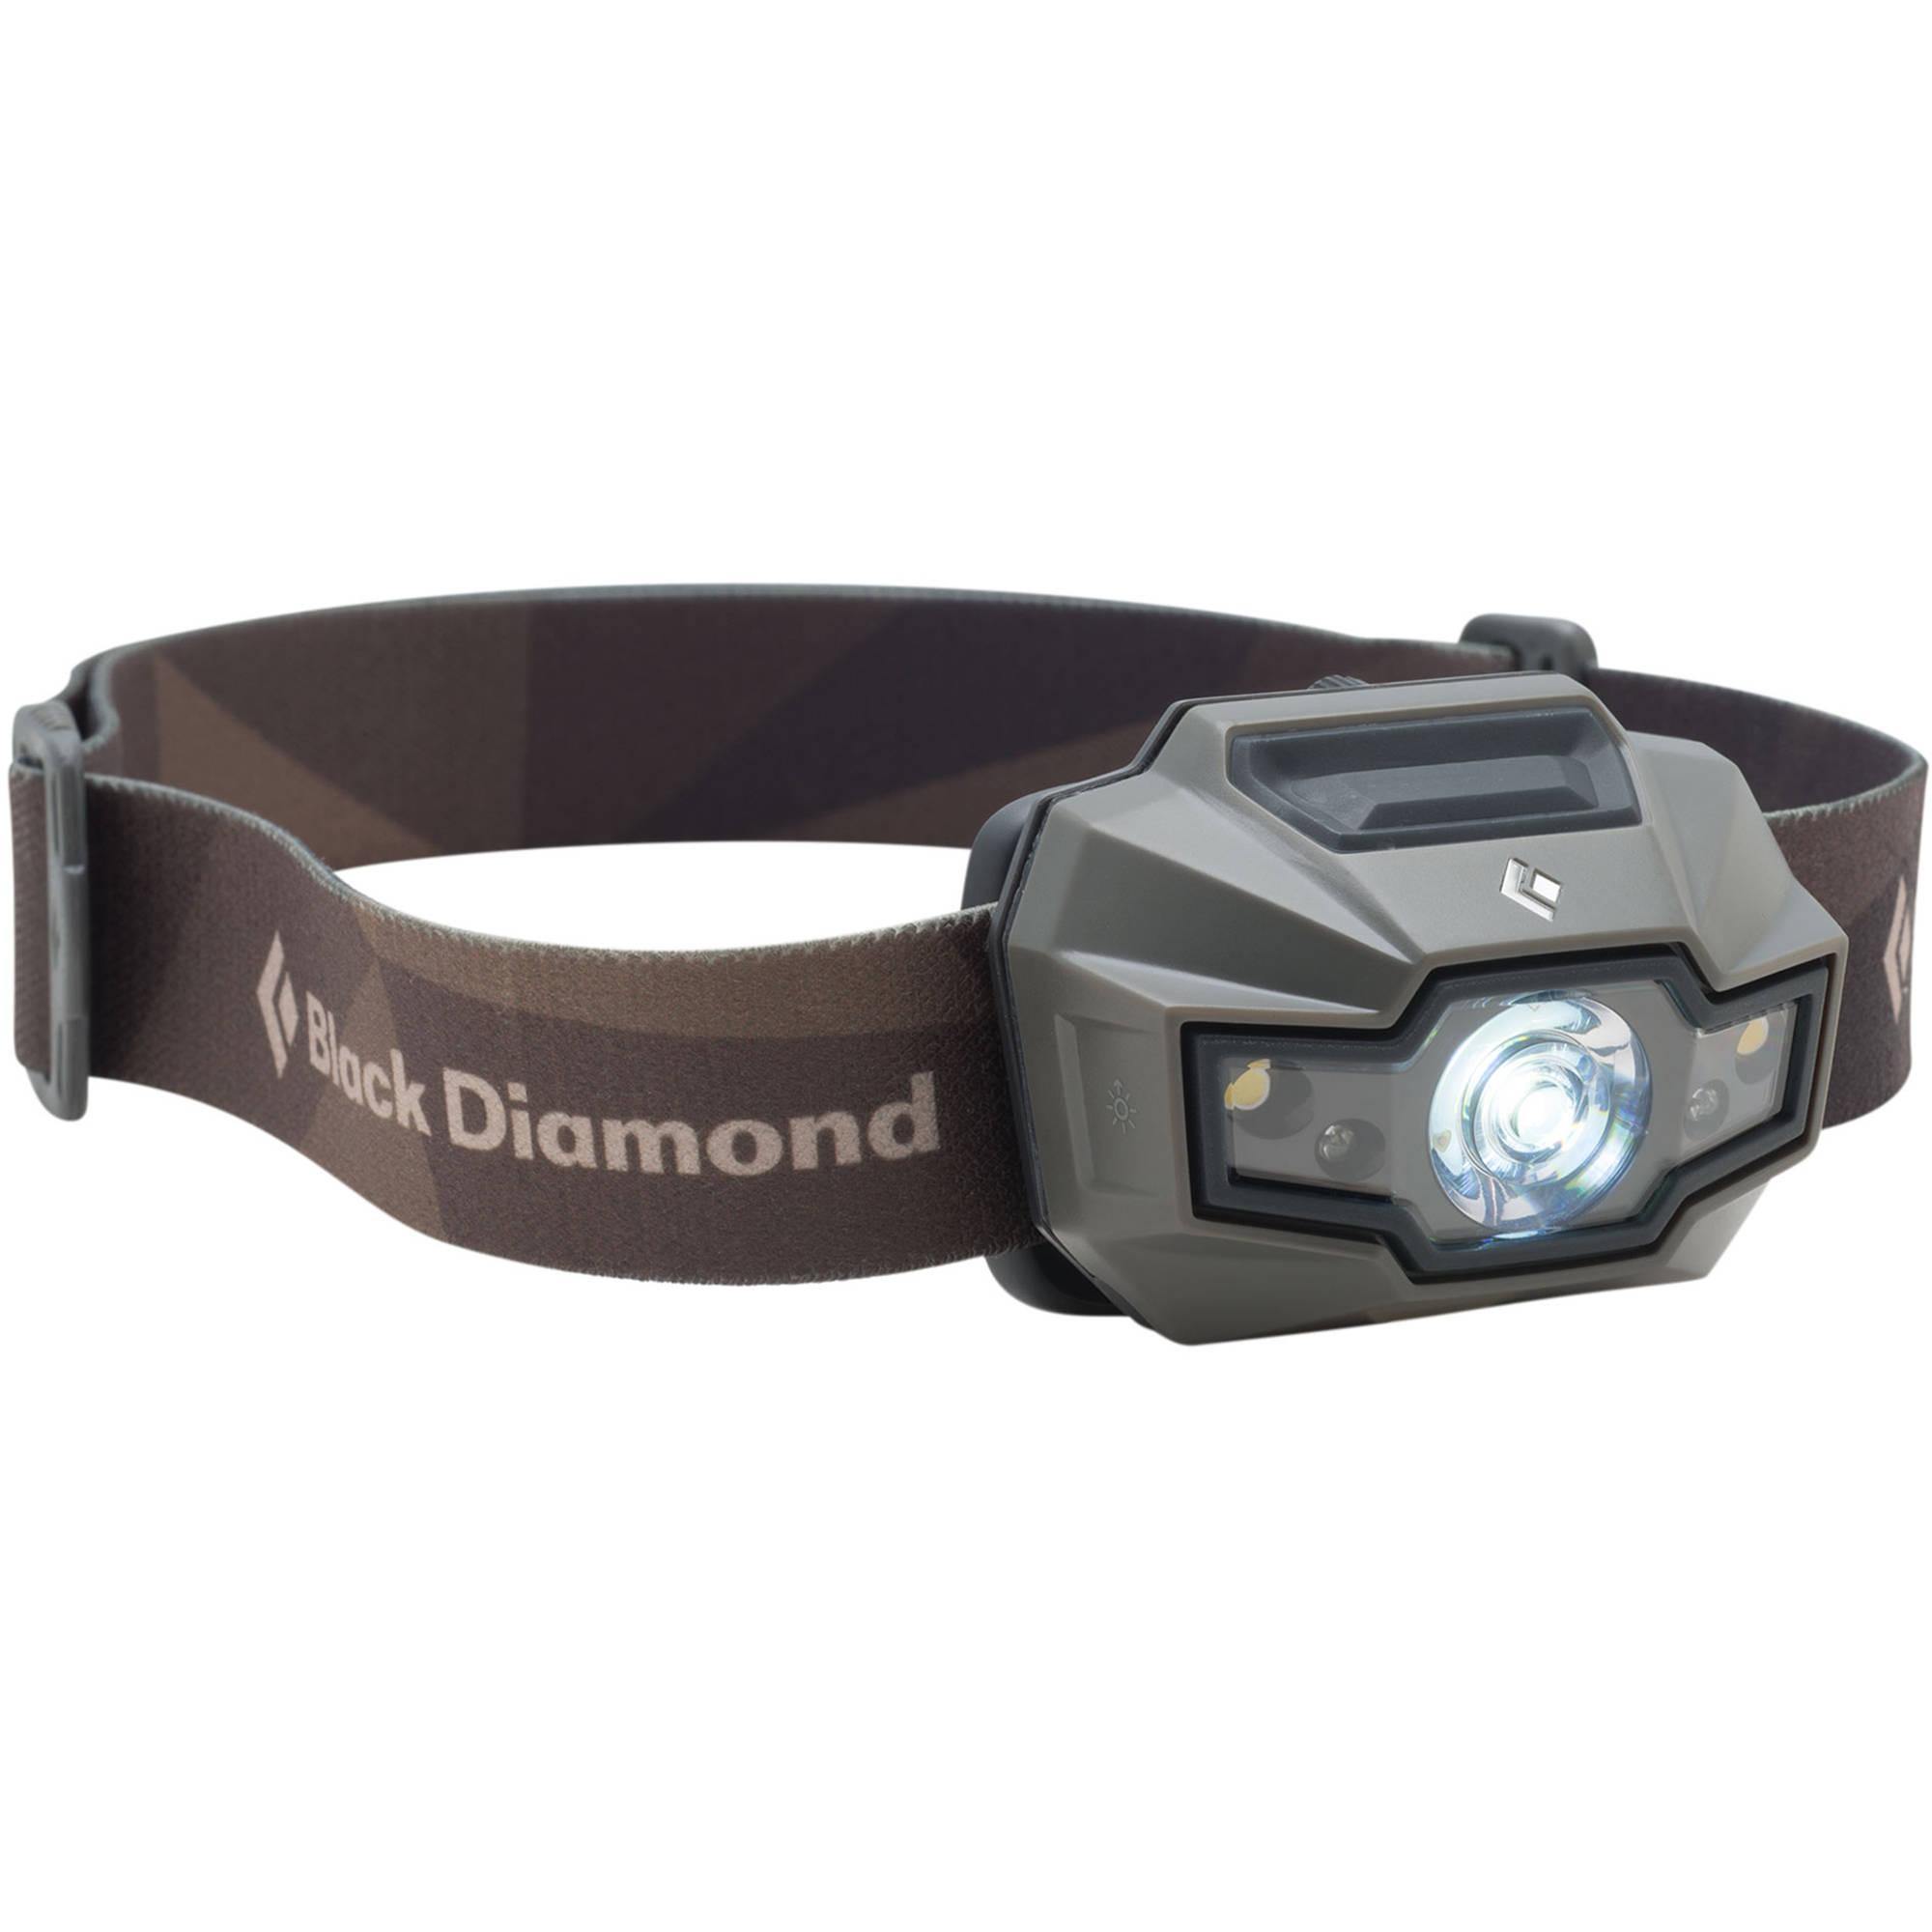 Black Diamond Storm LED Headlight BD620611RVGRALL1 B&H Photo